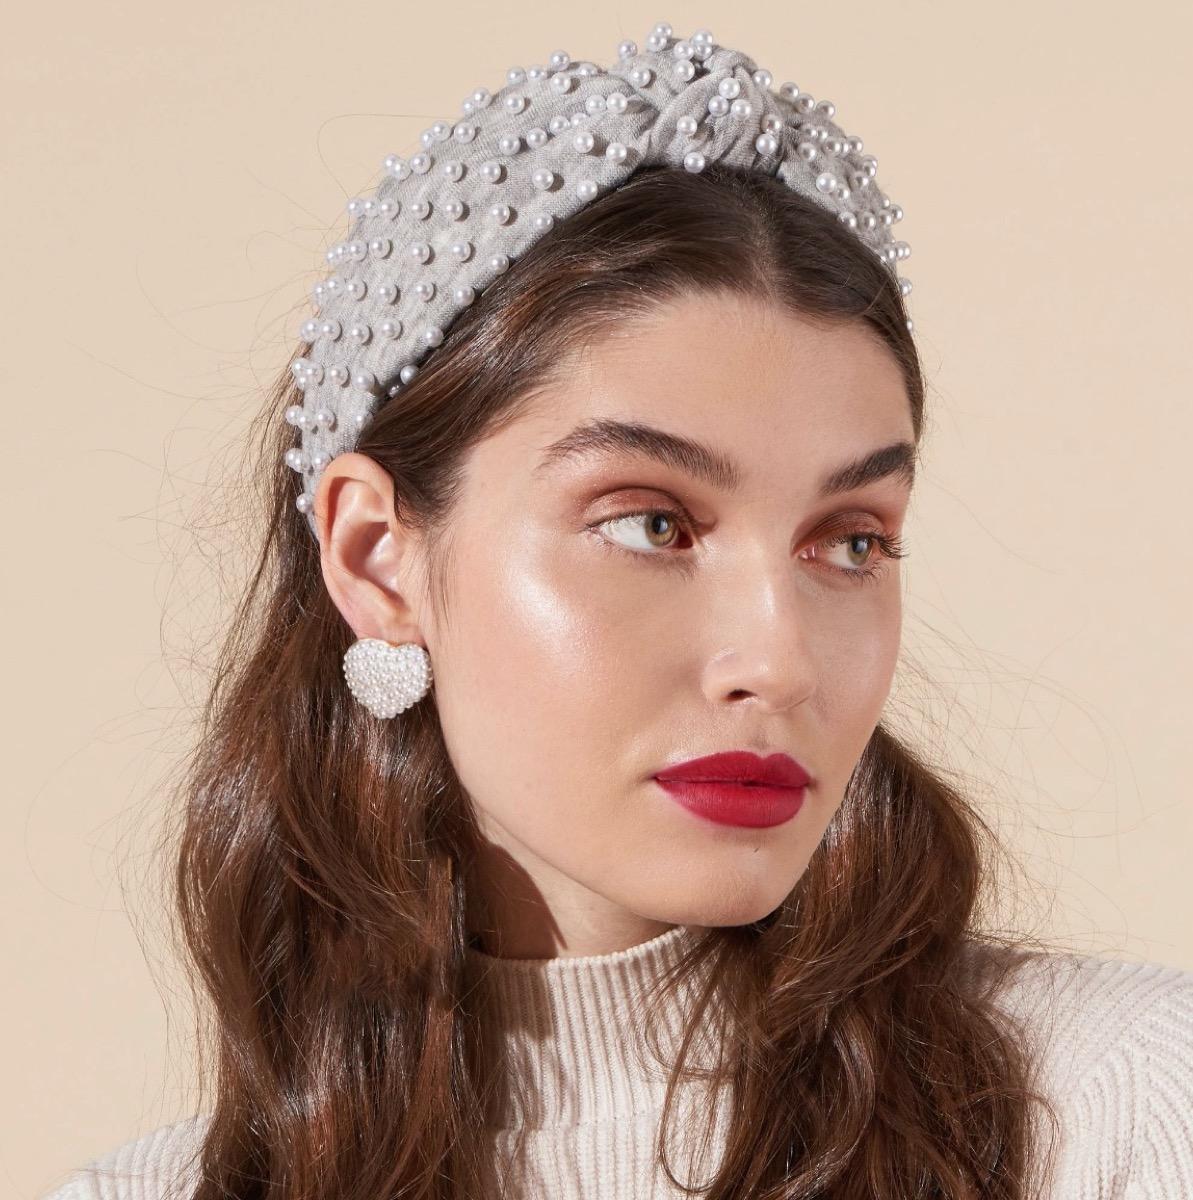 woman wearing gray headband with pearls